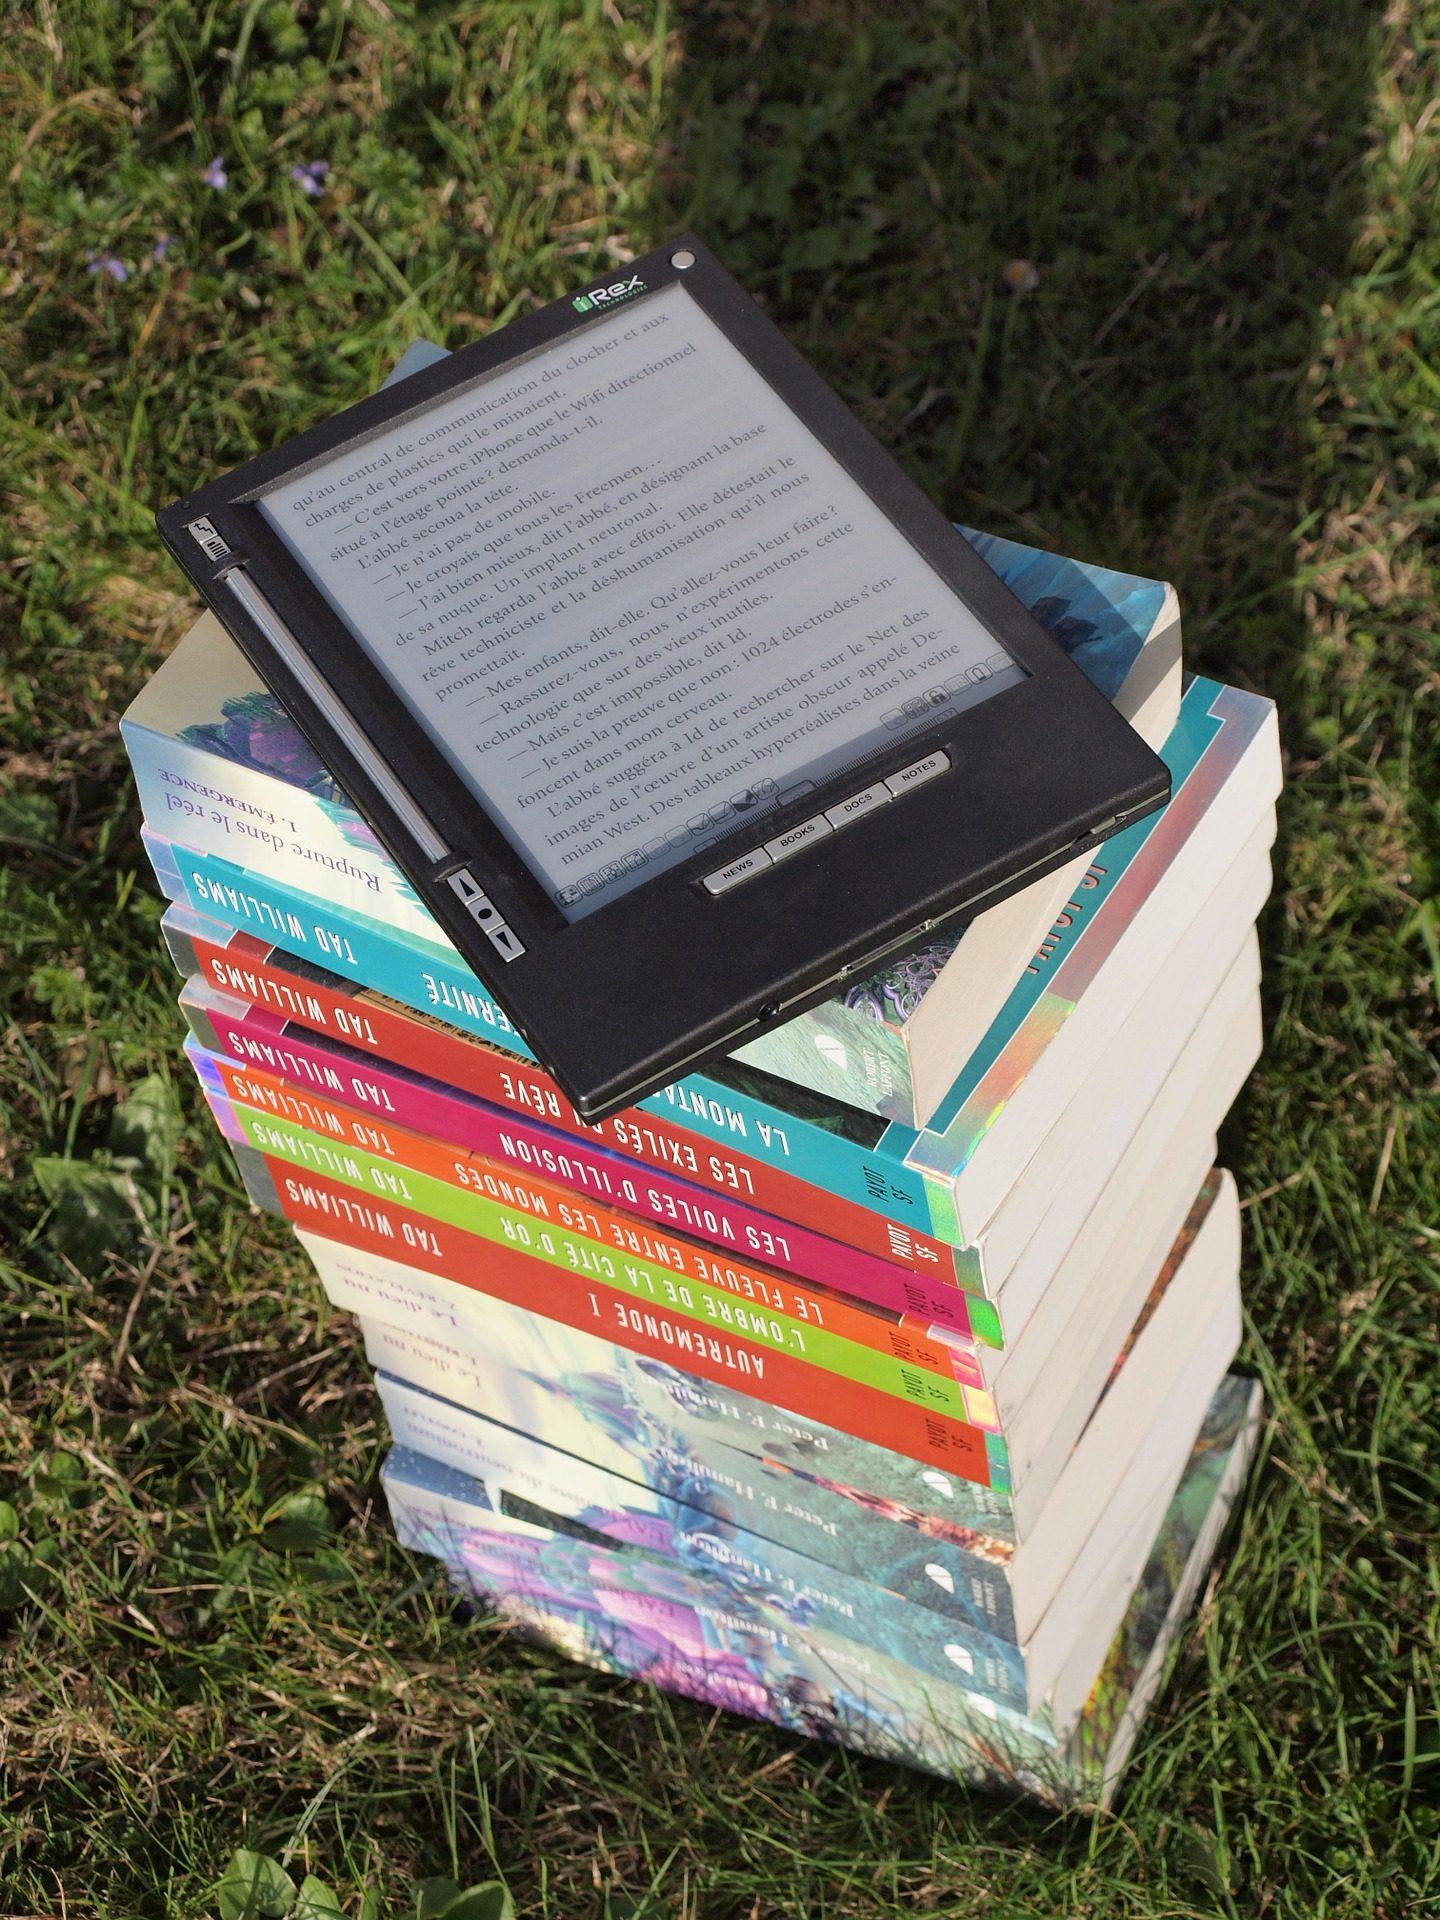 libros, montón, lector, electrónico, kindle, lectura - Fondos de Pantalla HD - professor-falken.com